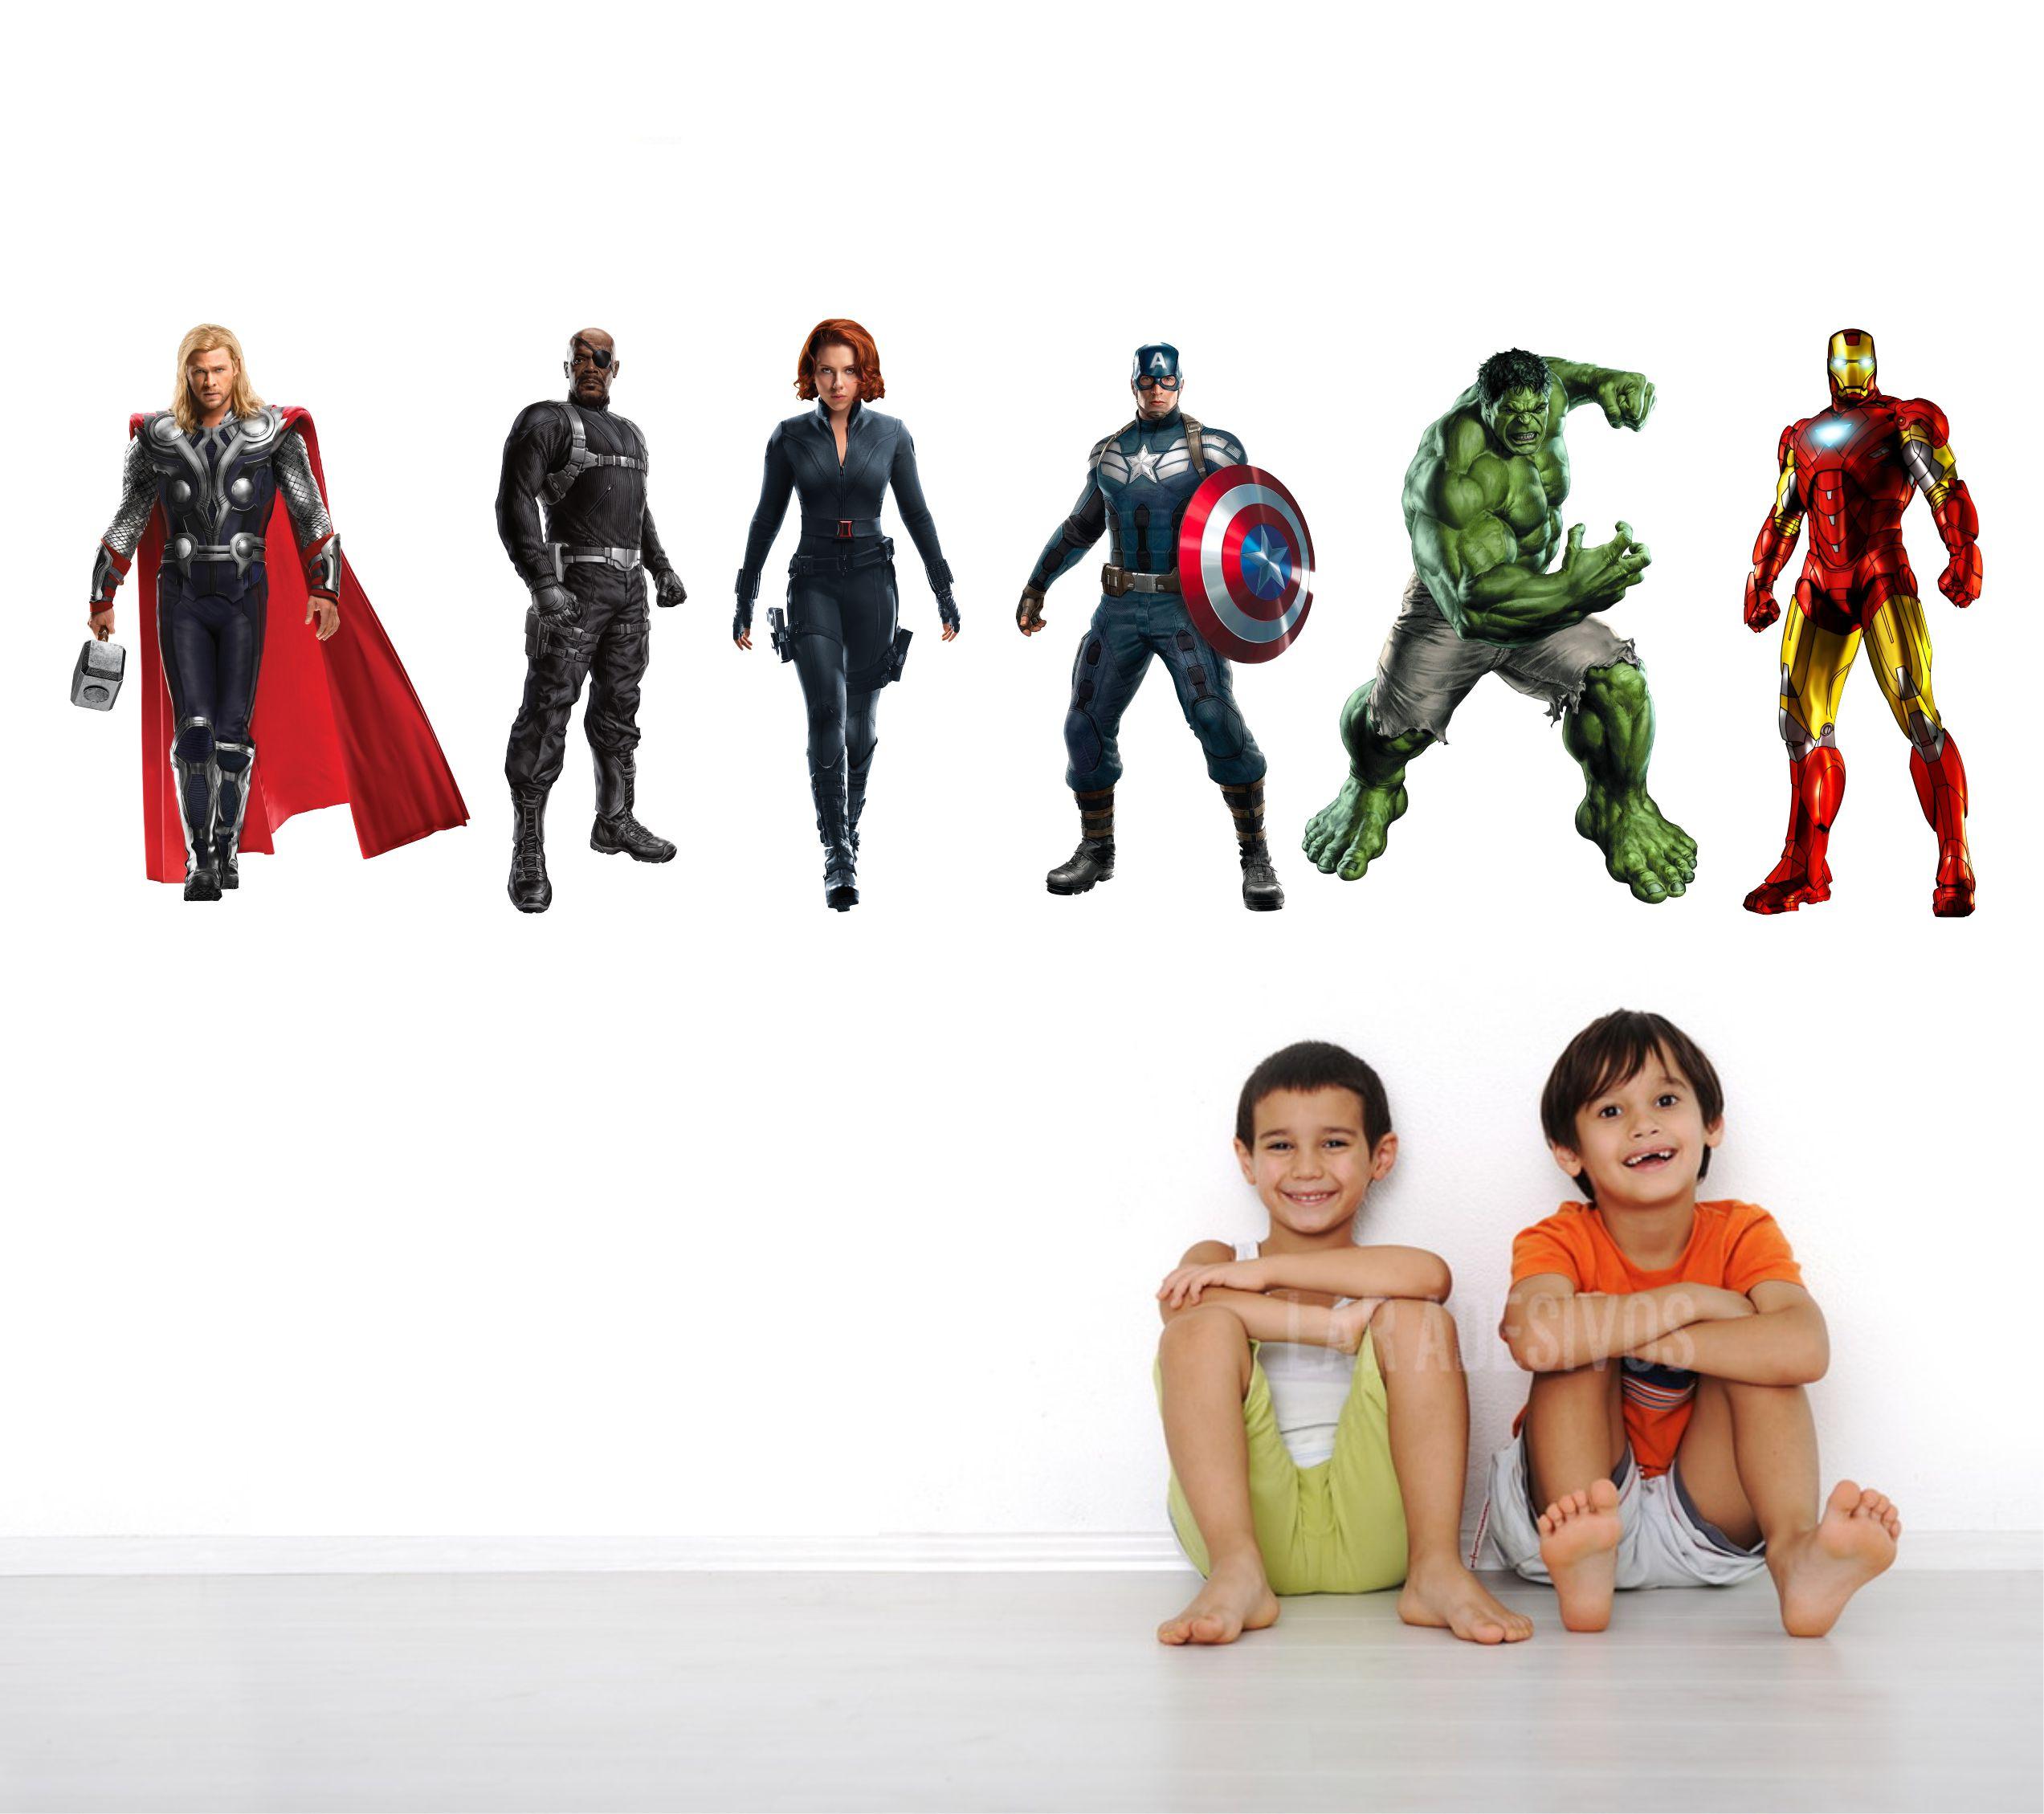 Adesivo Papel De Parede Vingadores Avengers Hulk Thor No Elo7